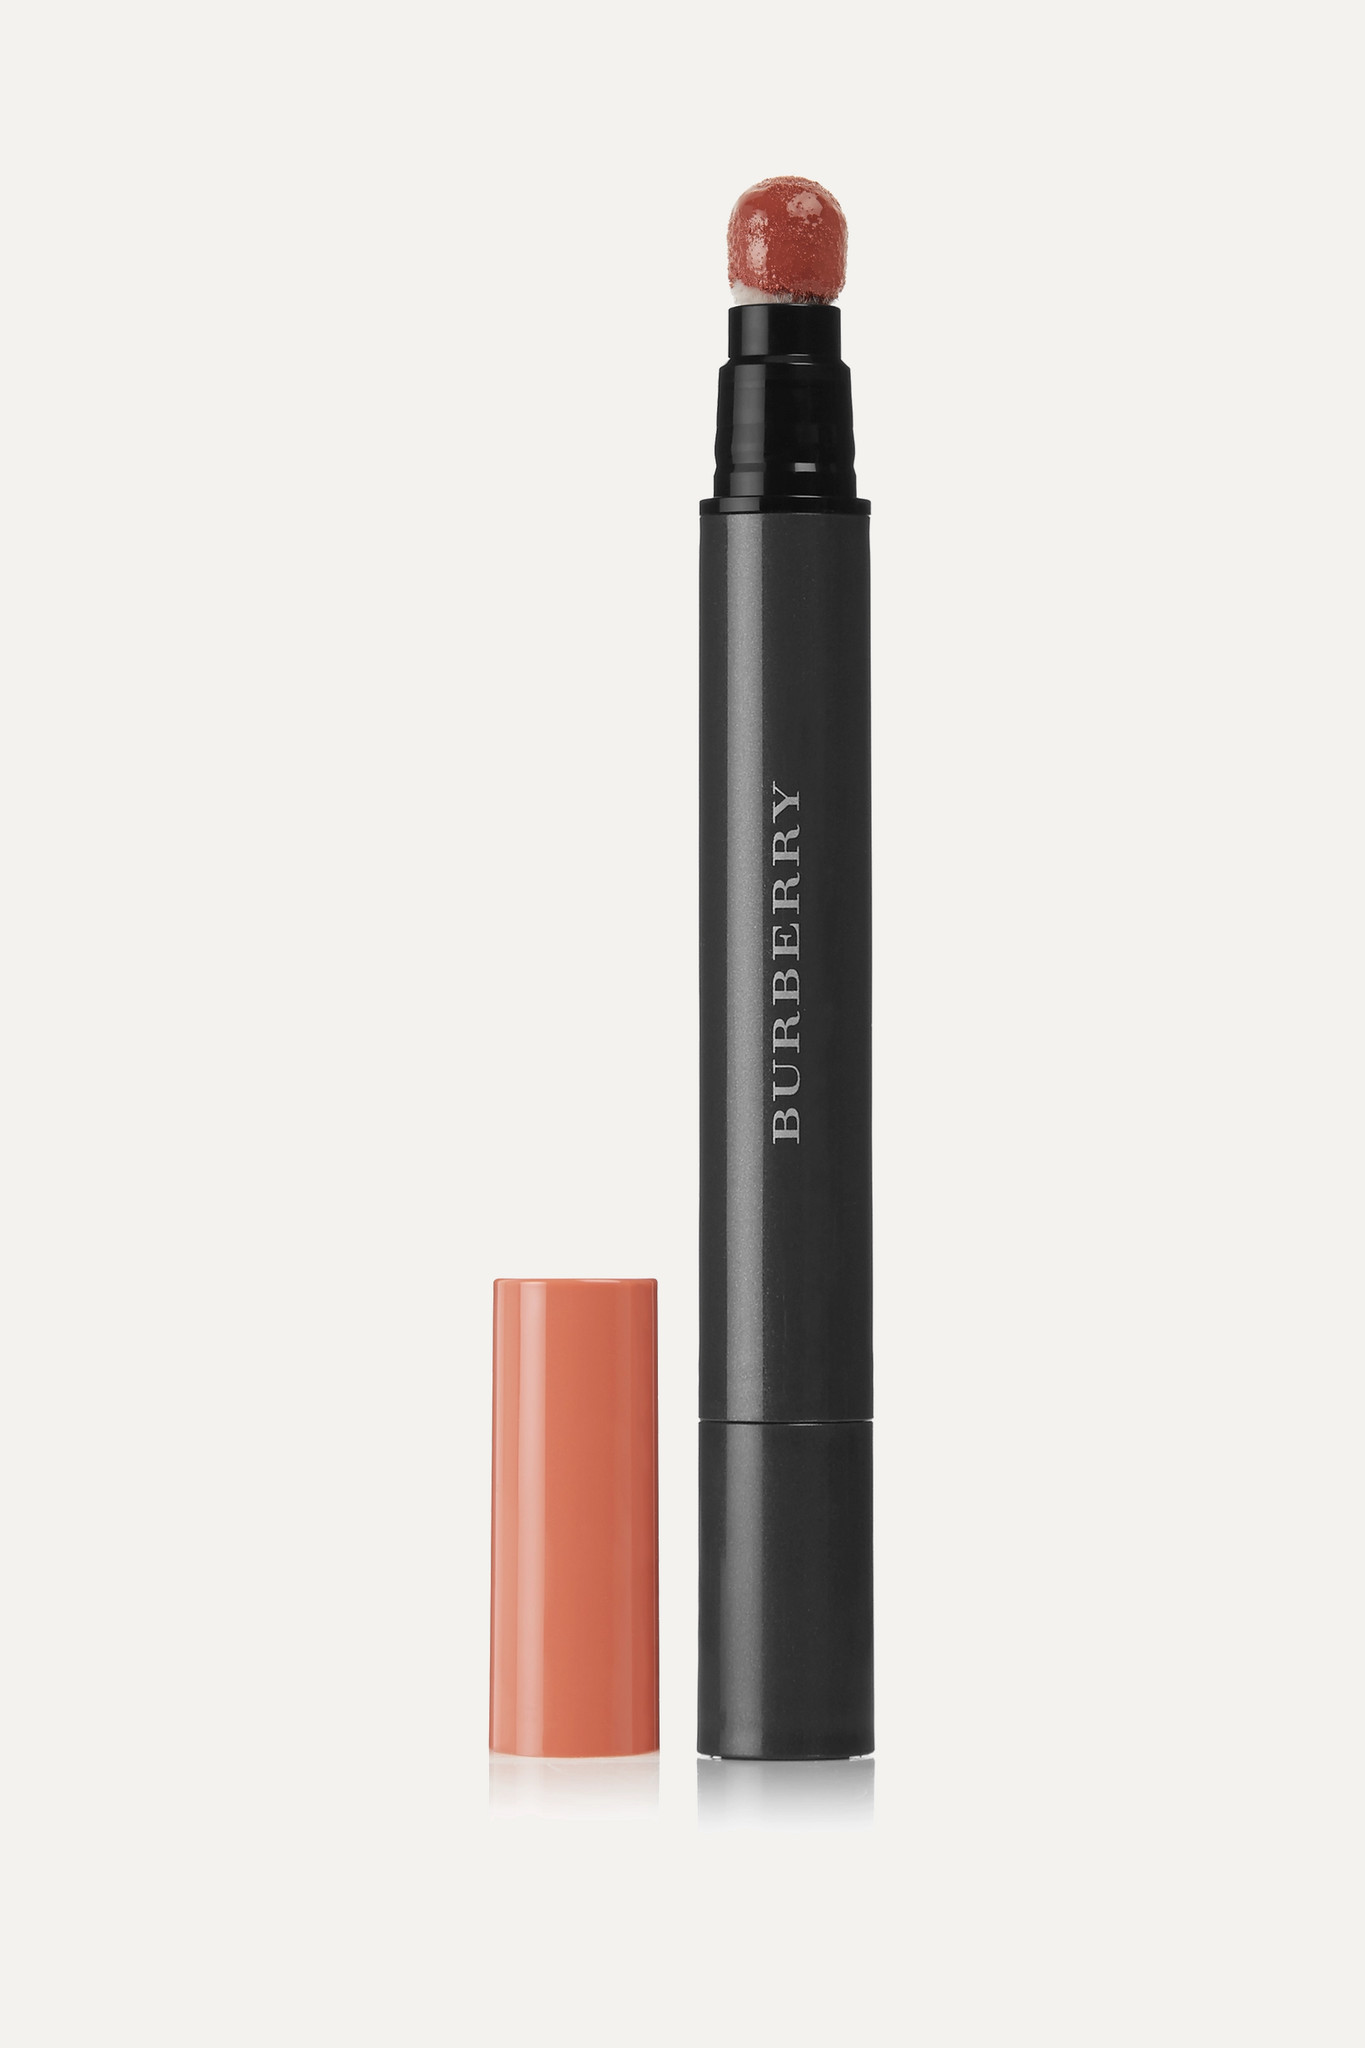 BURBERRY BEAUTY - Lip Velvet Crush - Honey Nude No.10 - Neutrals - one size